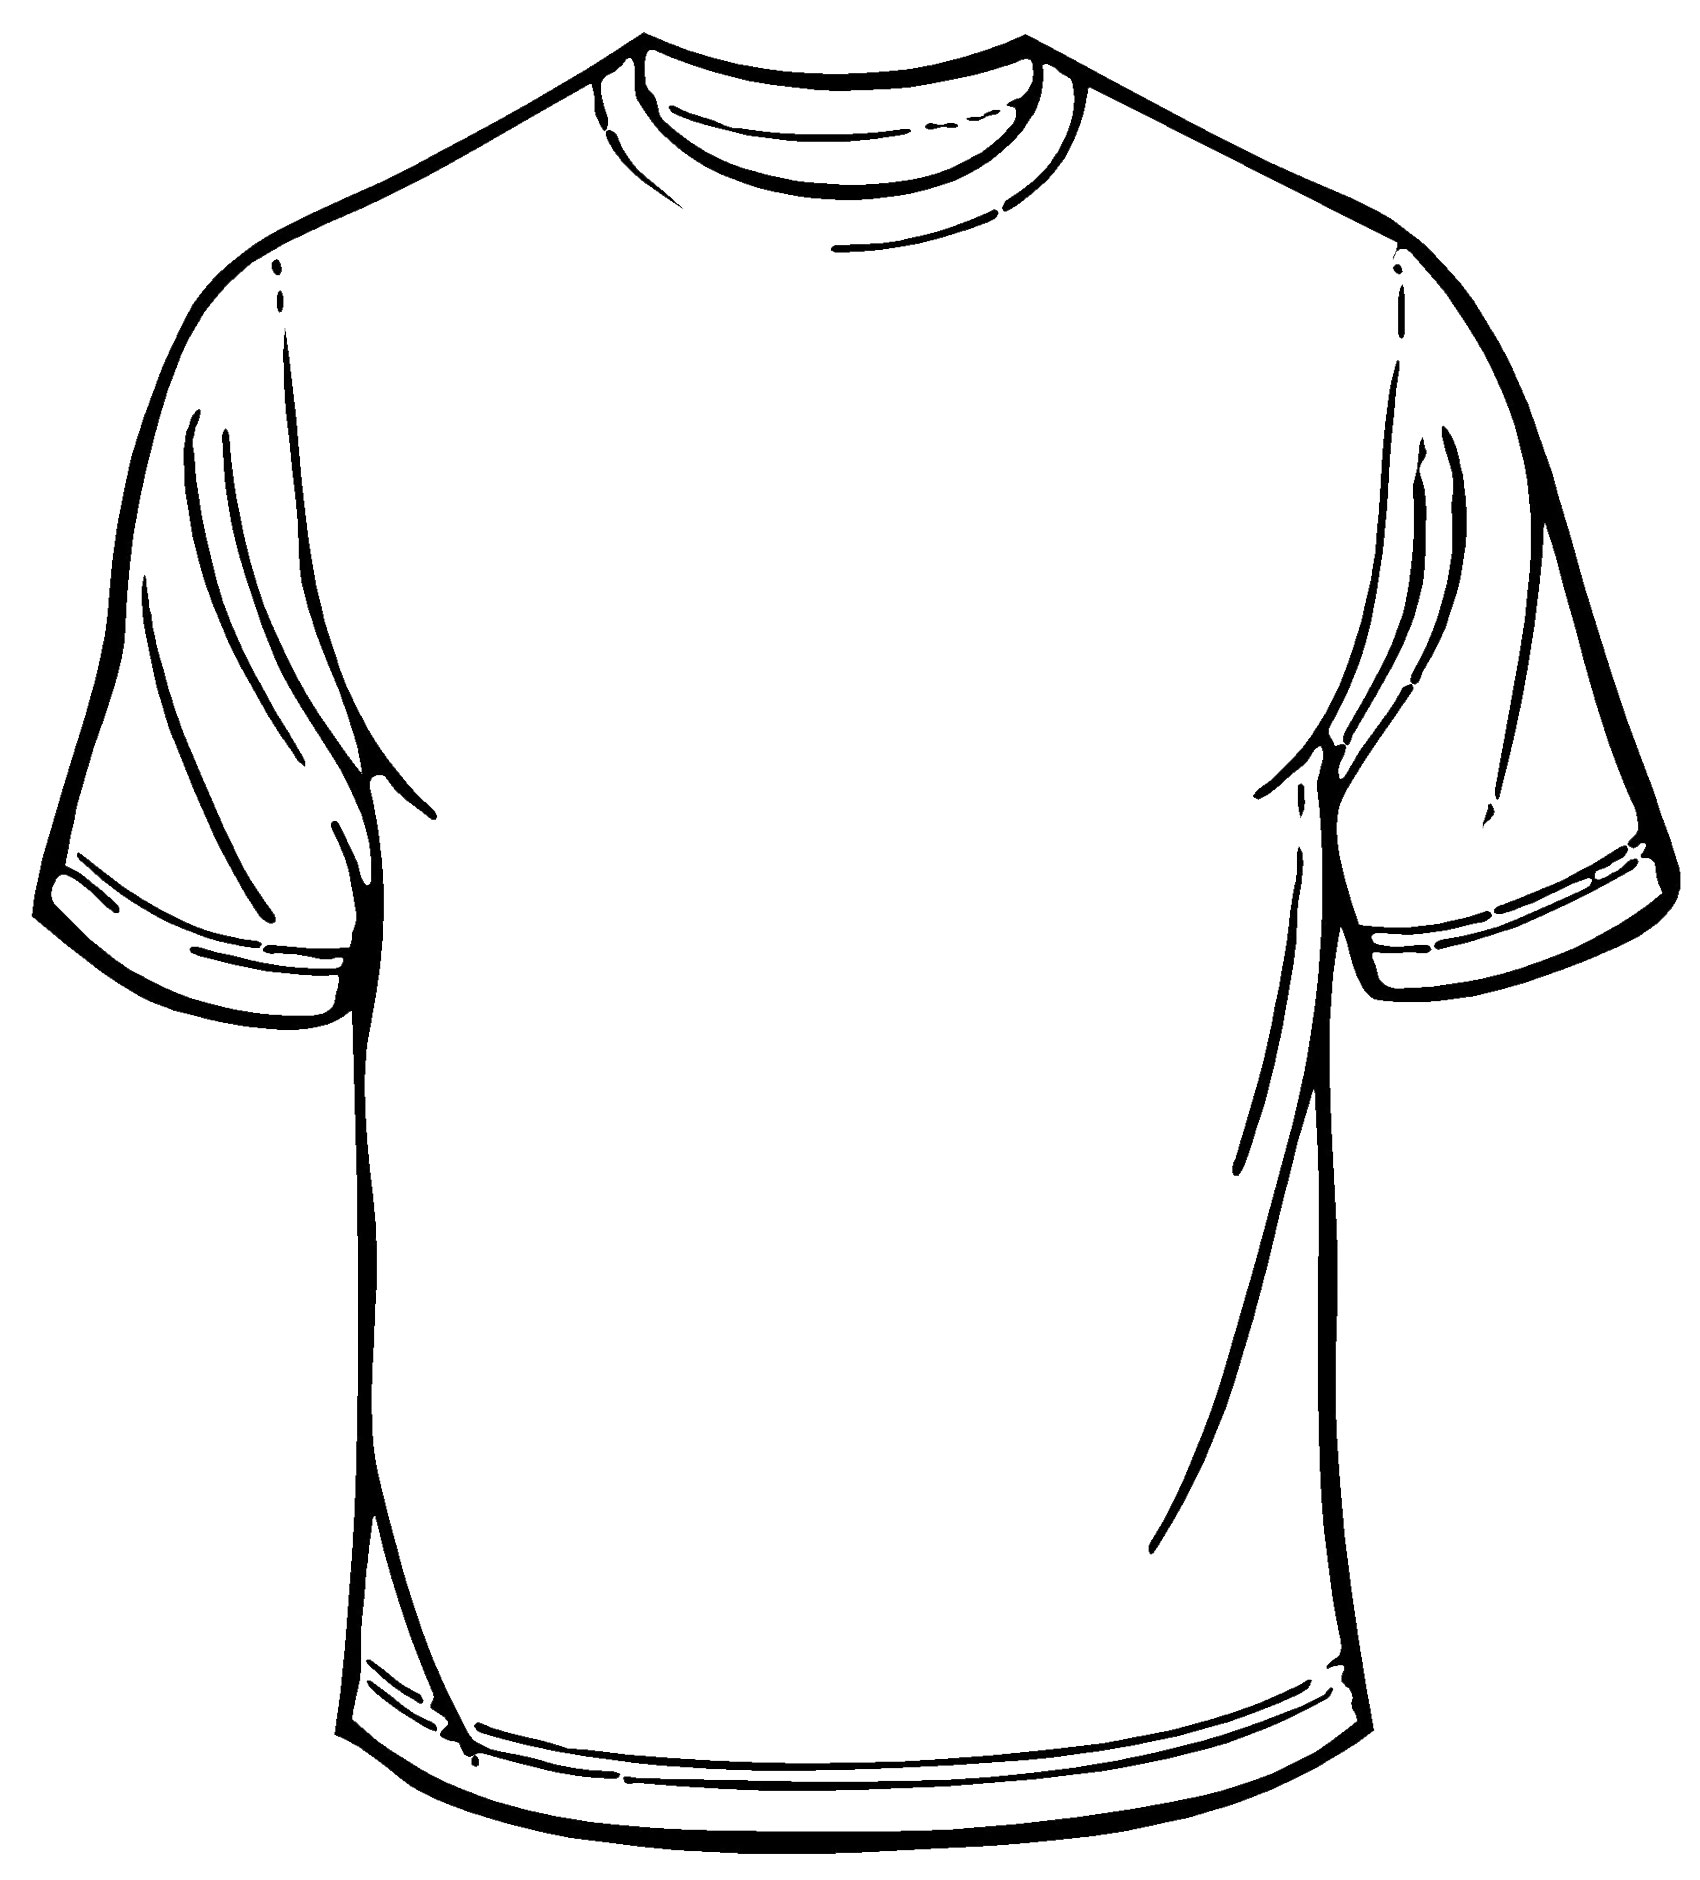 Free Blank Tshirt Download Free Clip Art Free Clip Art